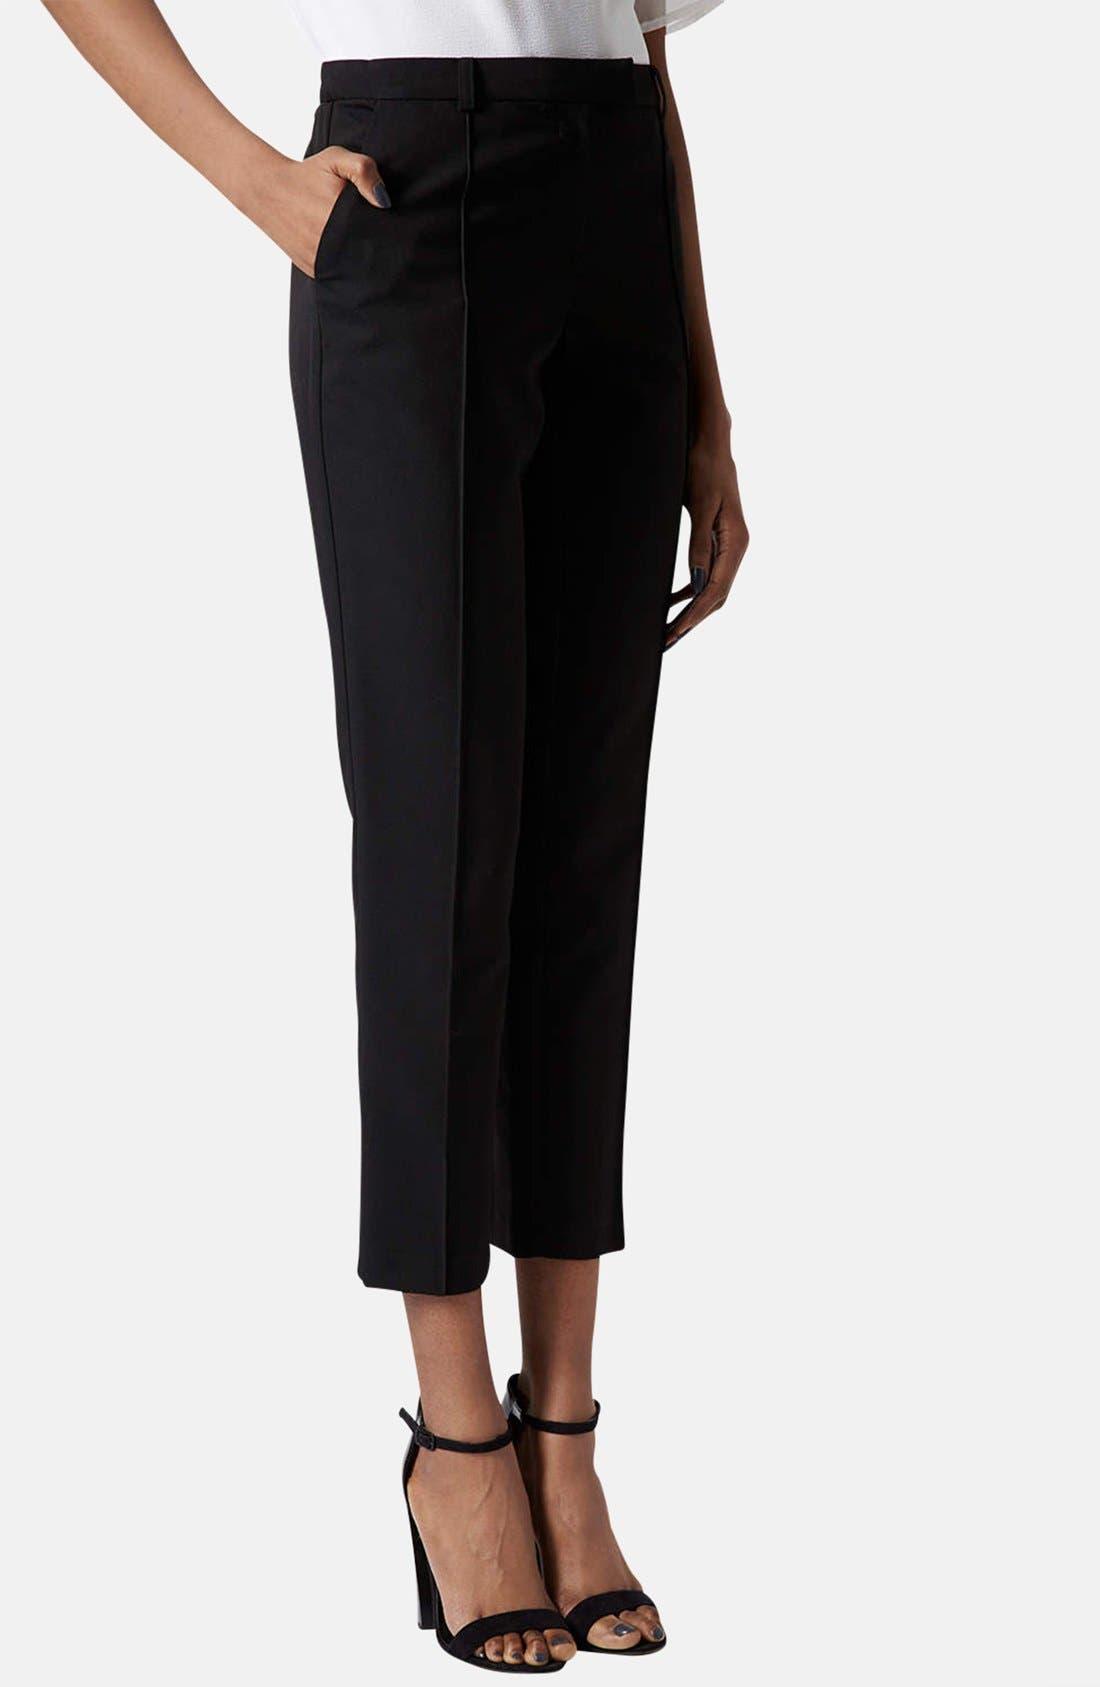 Alternate Image 1 Selected - Topshop Crop Cigarette Pants (Regular & Short)